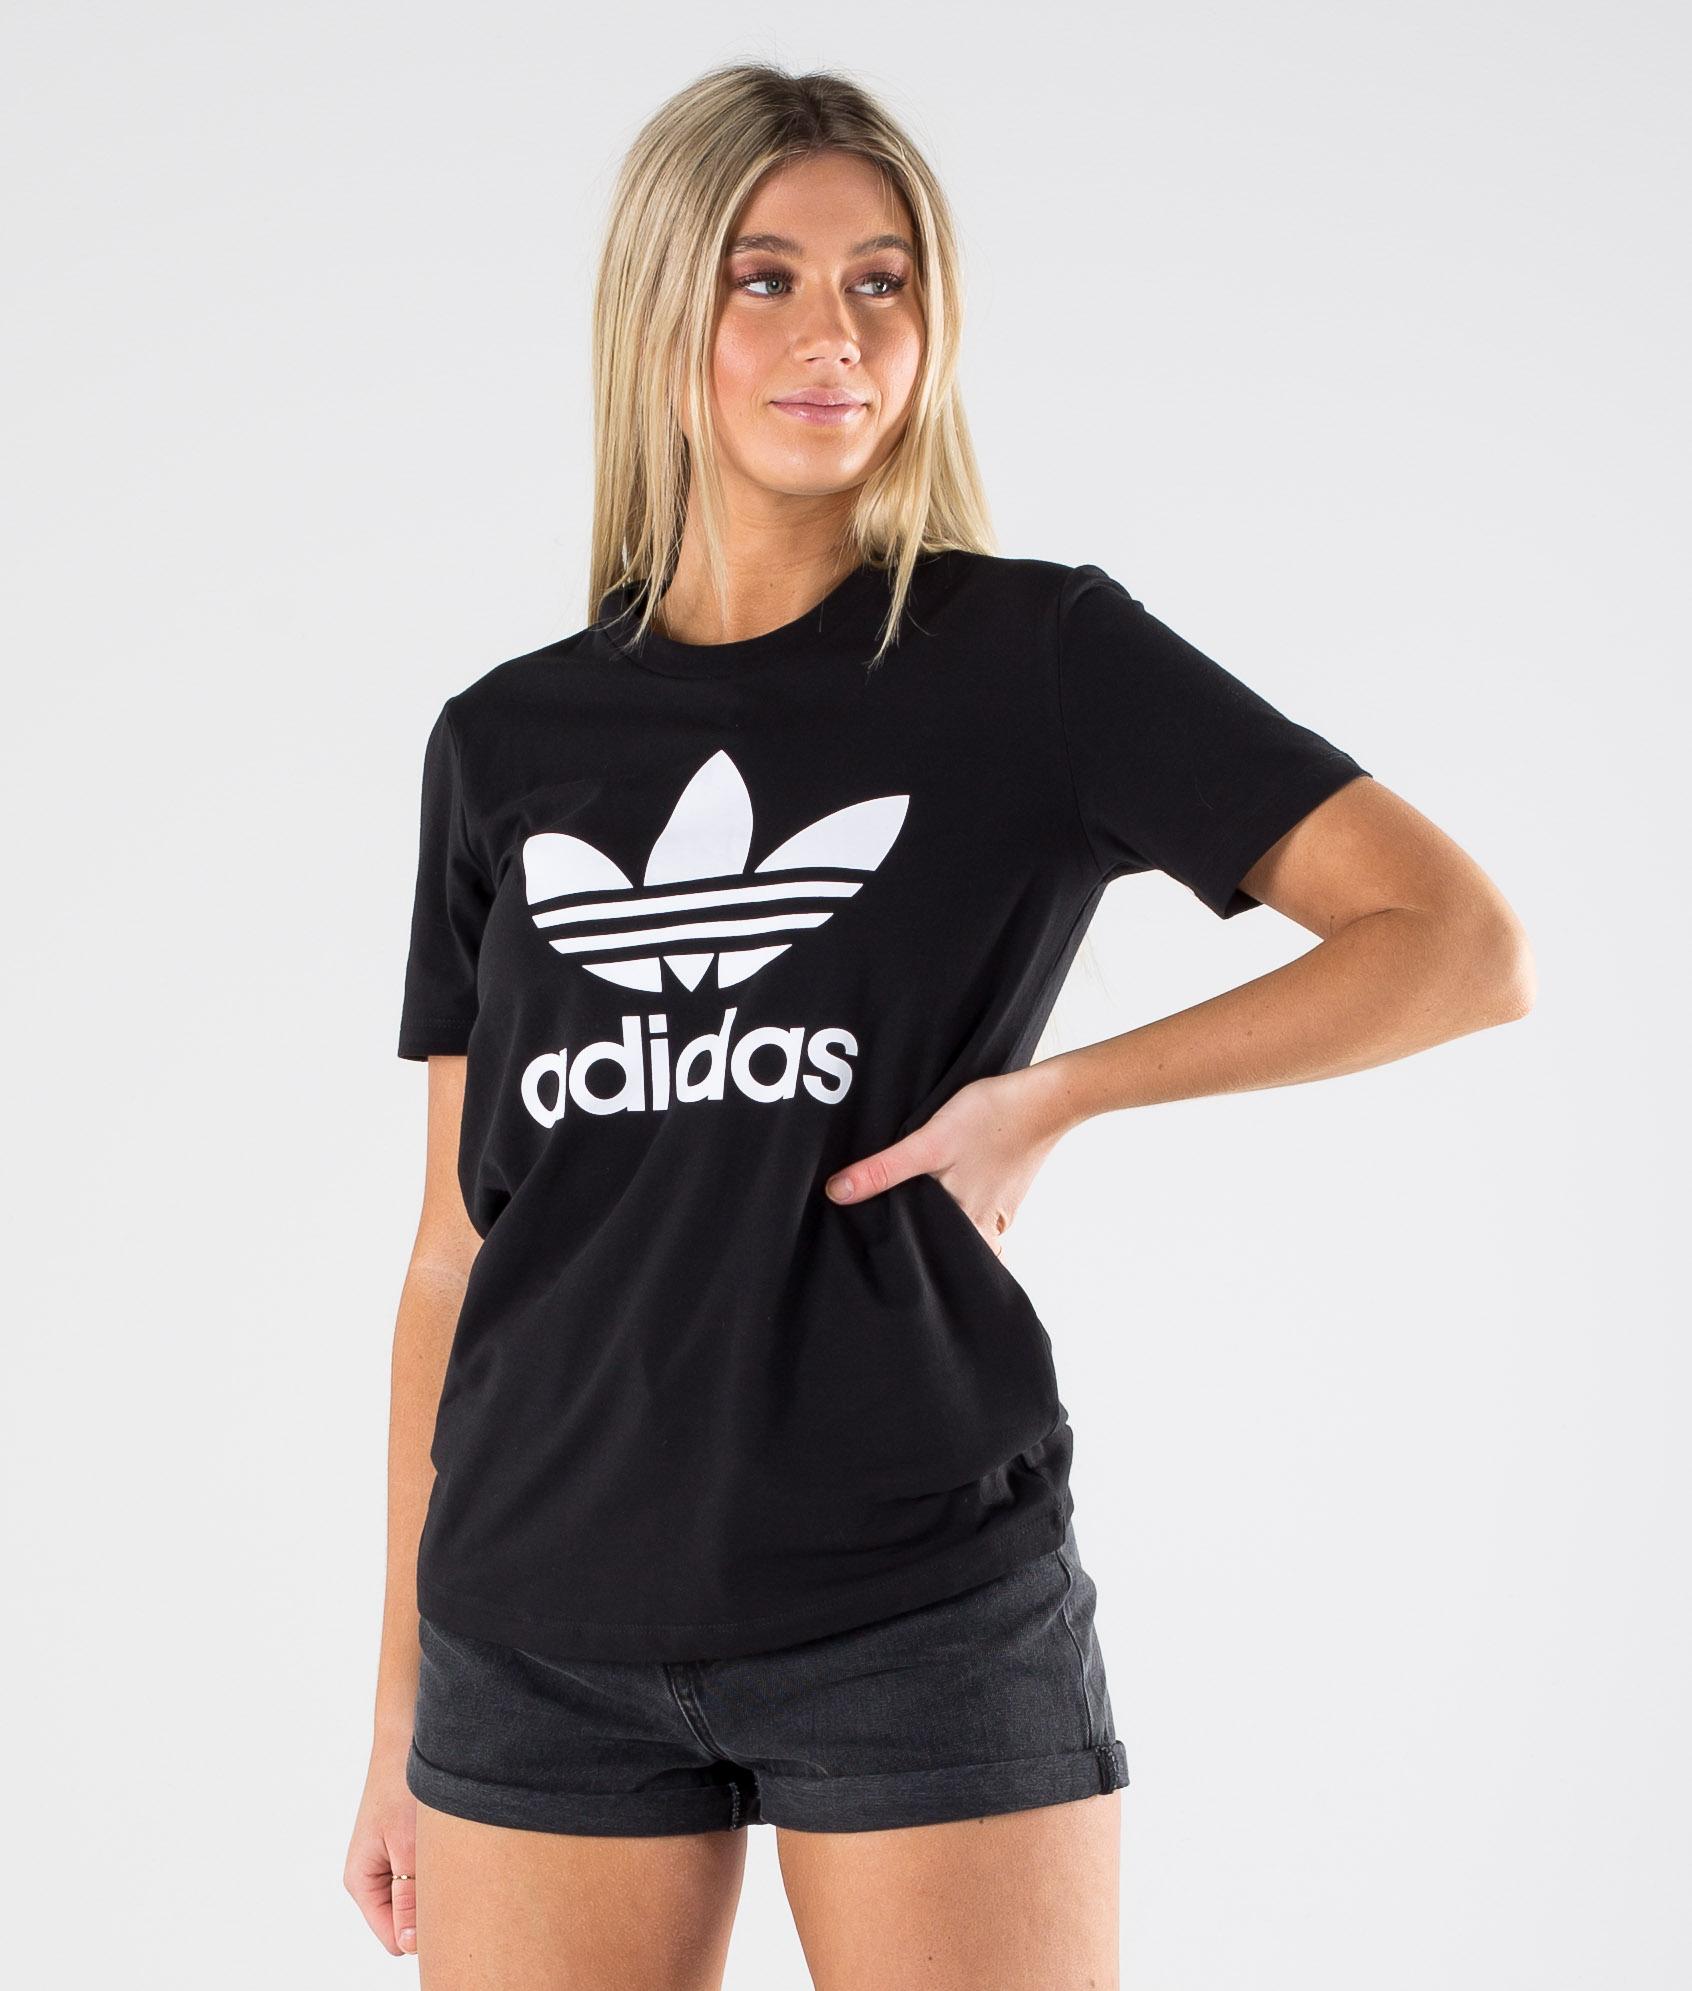 adidas long shirt dames